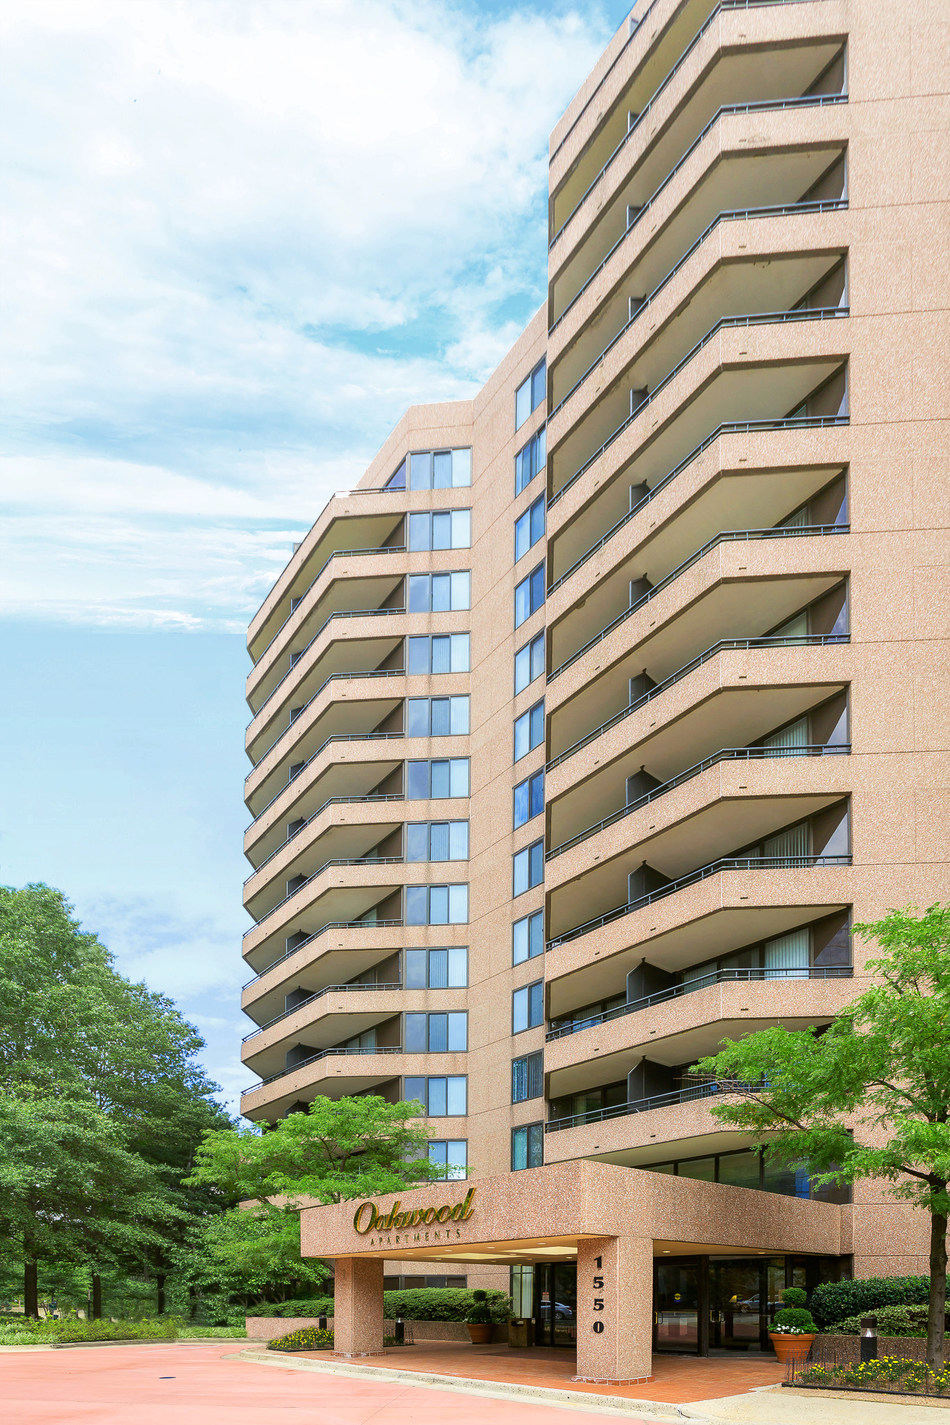 Oakwood Strengthens Serviced Apartment Footprint in Northern Virginia